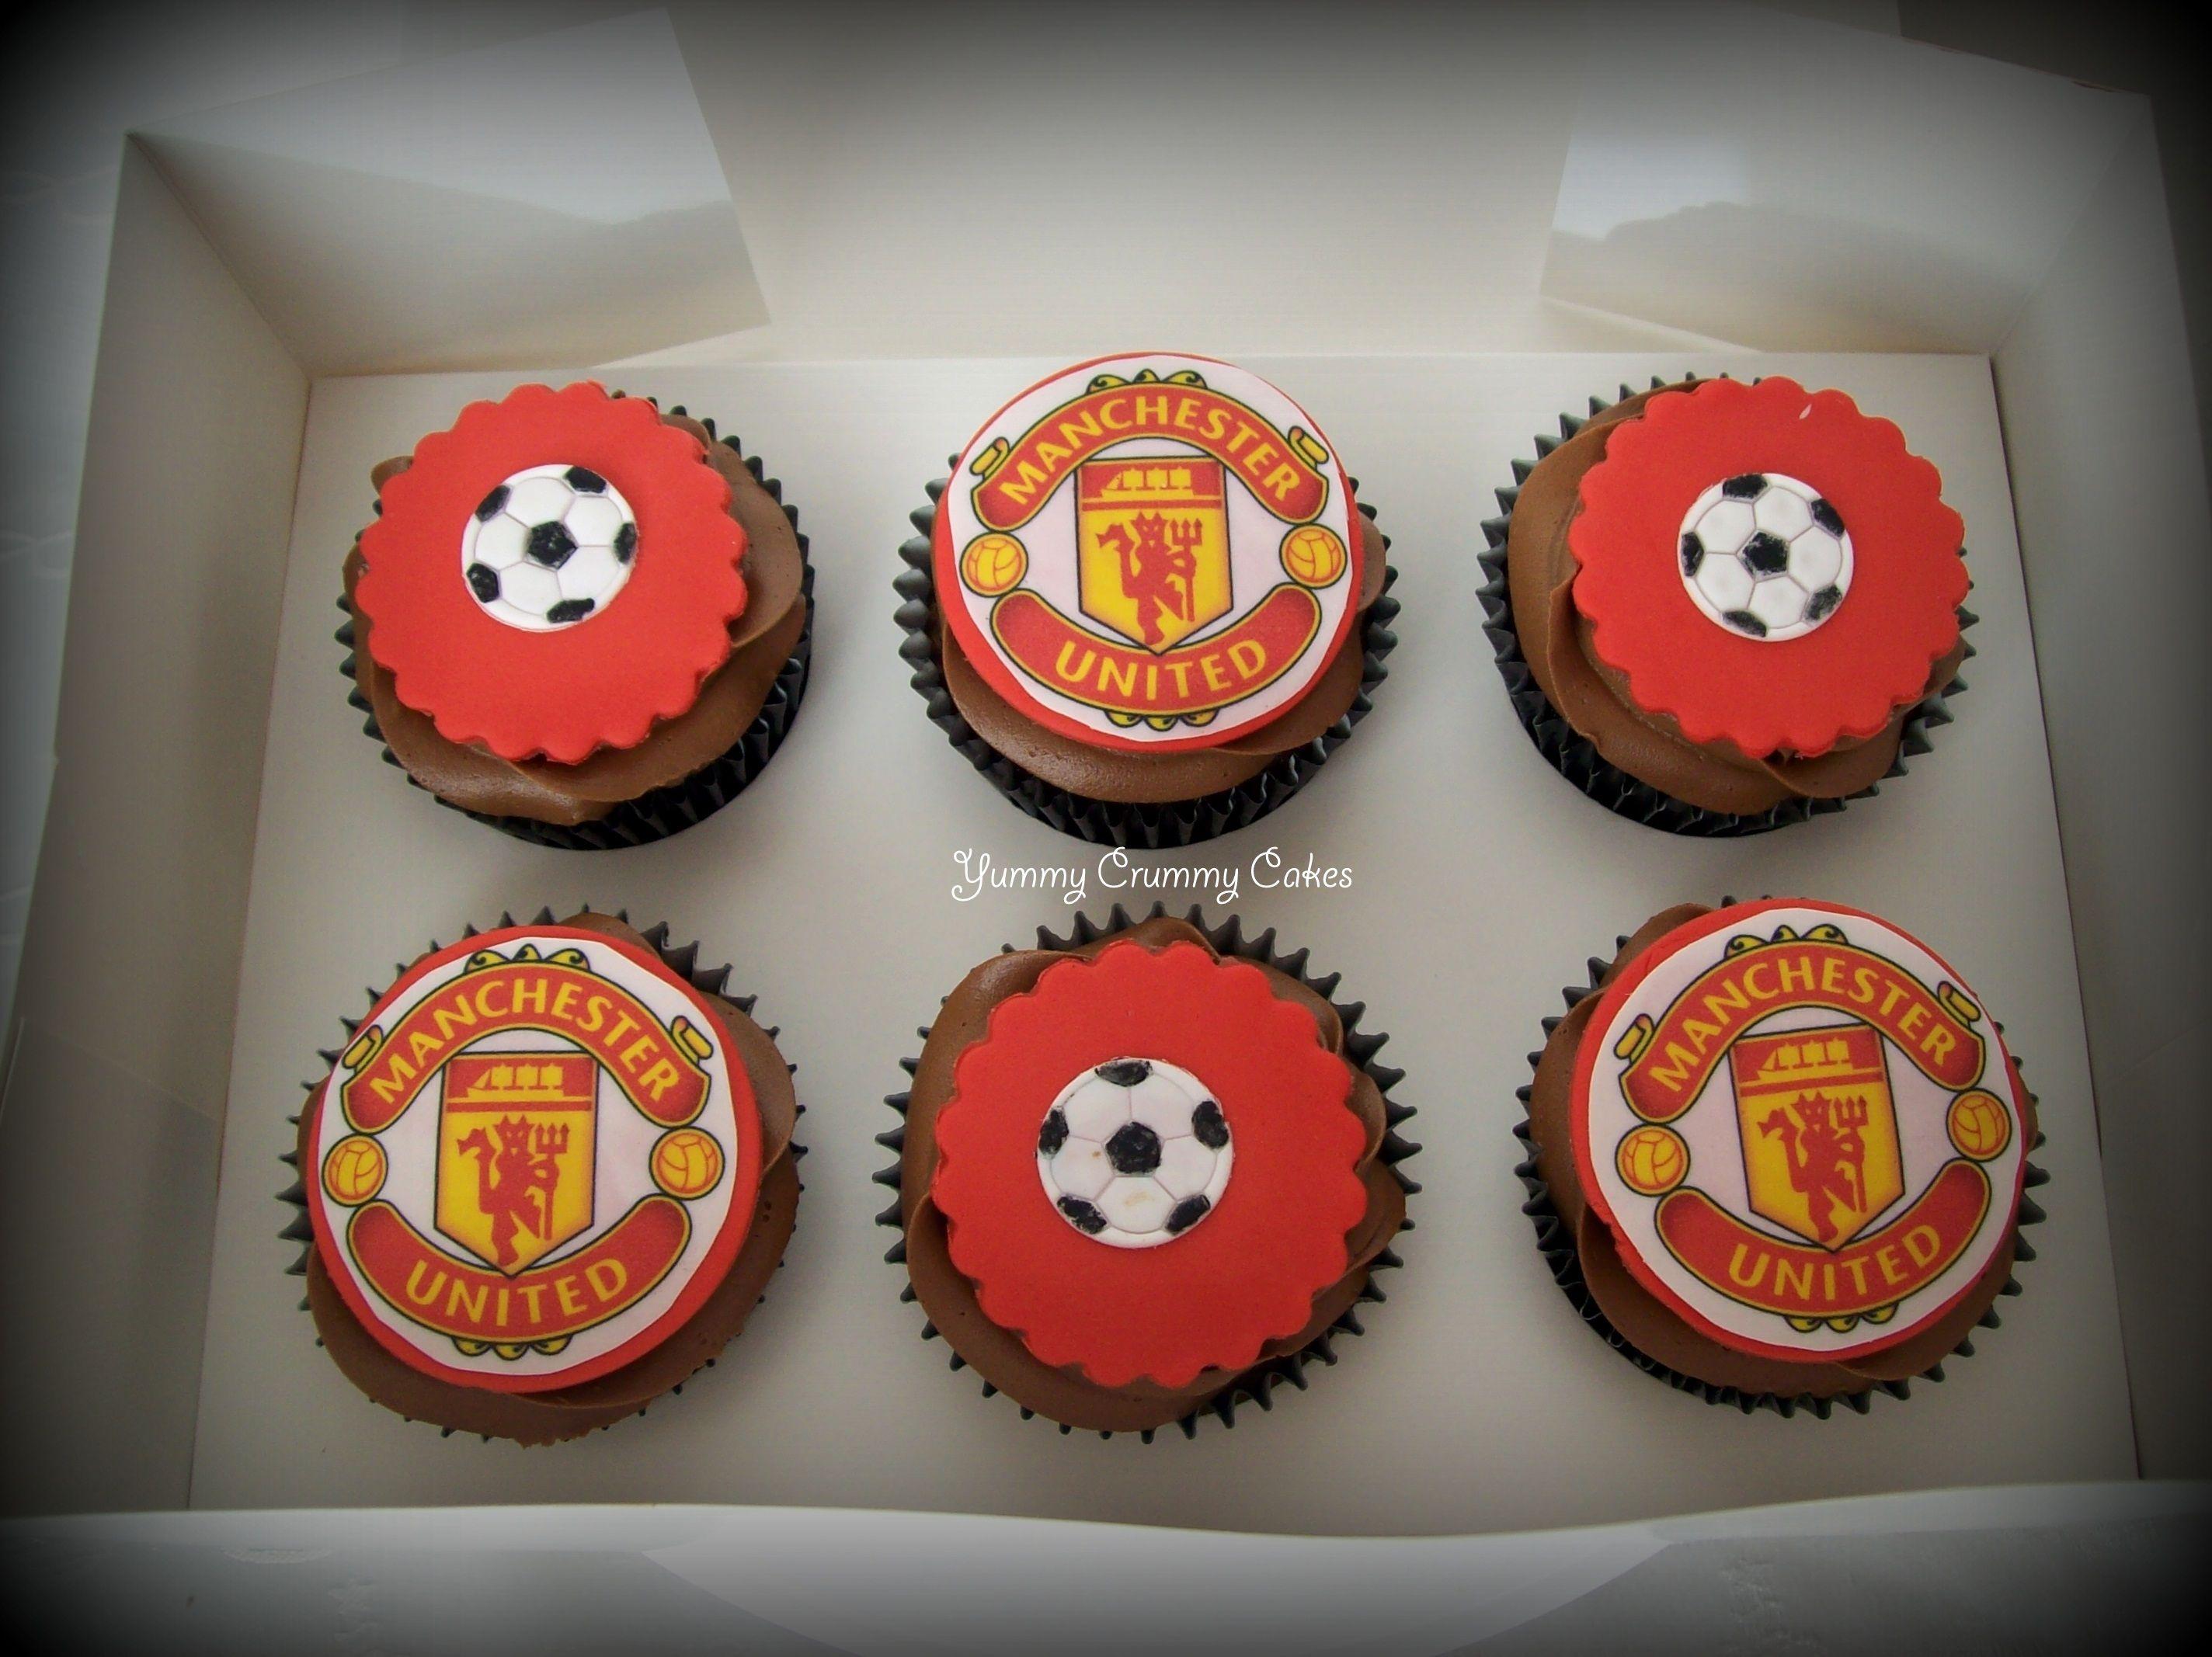 Yummy Crummy Cakes Soccer Birthday Cakes Manchester United Birthday Cake Soccer Birthday Parties